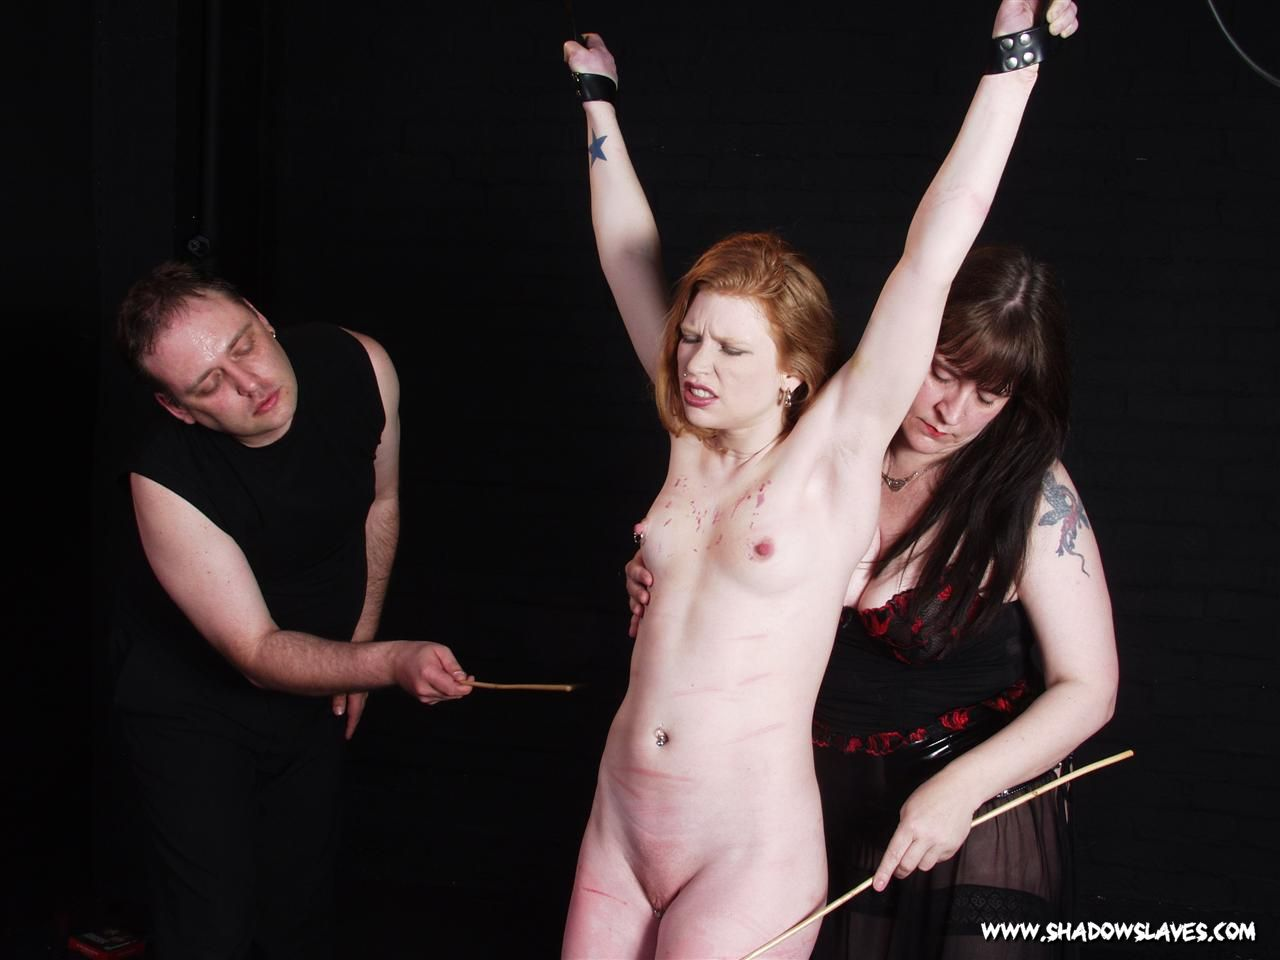 madison young bondage videos